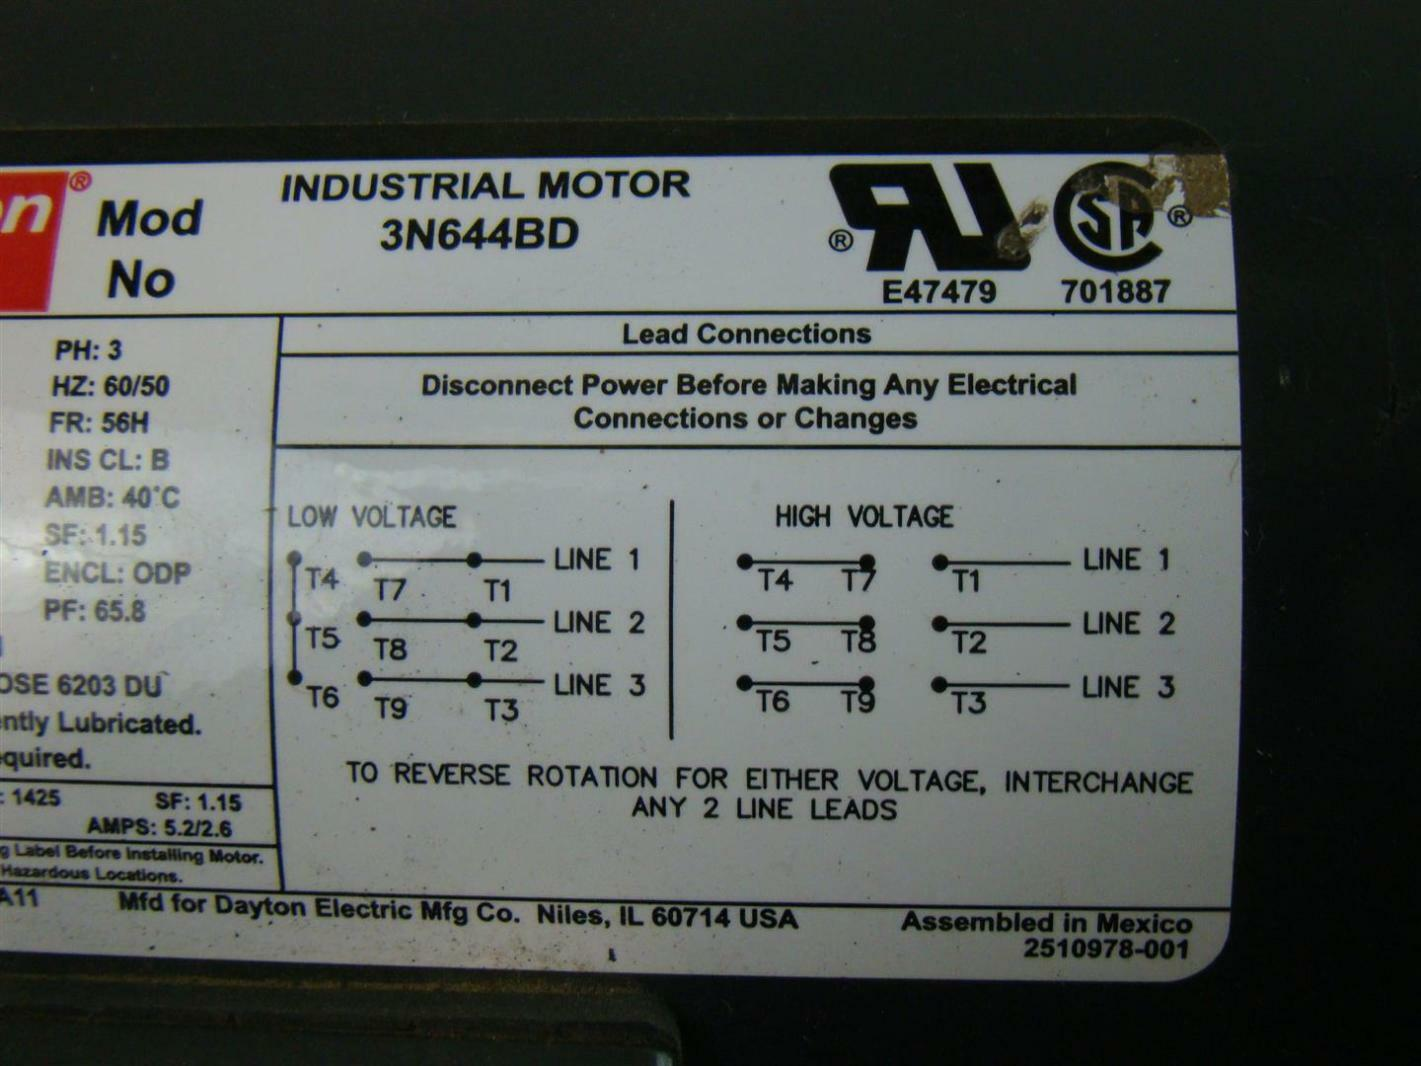 3 phase ups wiring diagram circuit precipitation water cycle dayton industrial motor 1-1/2 hp ph3 208-230/460v 5.4-5.6/2.8amps 3n644bd | ebay